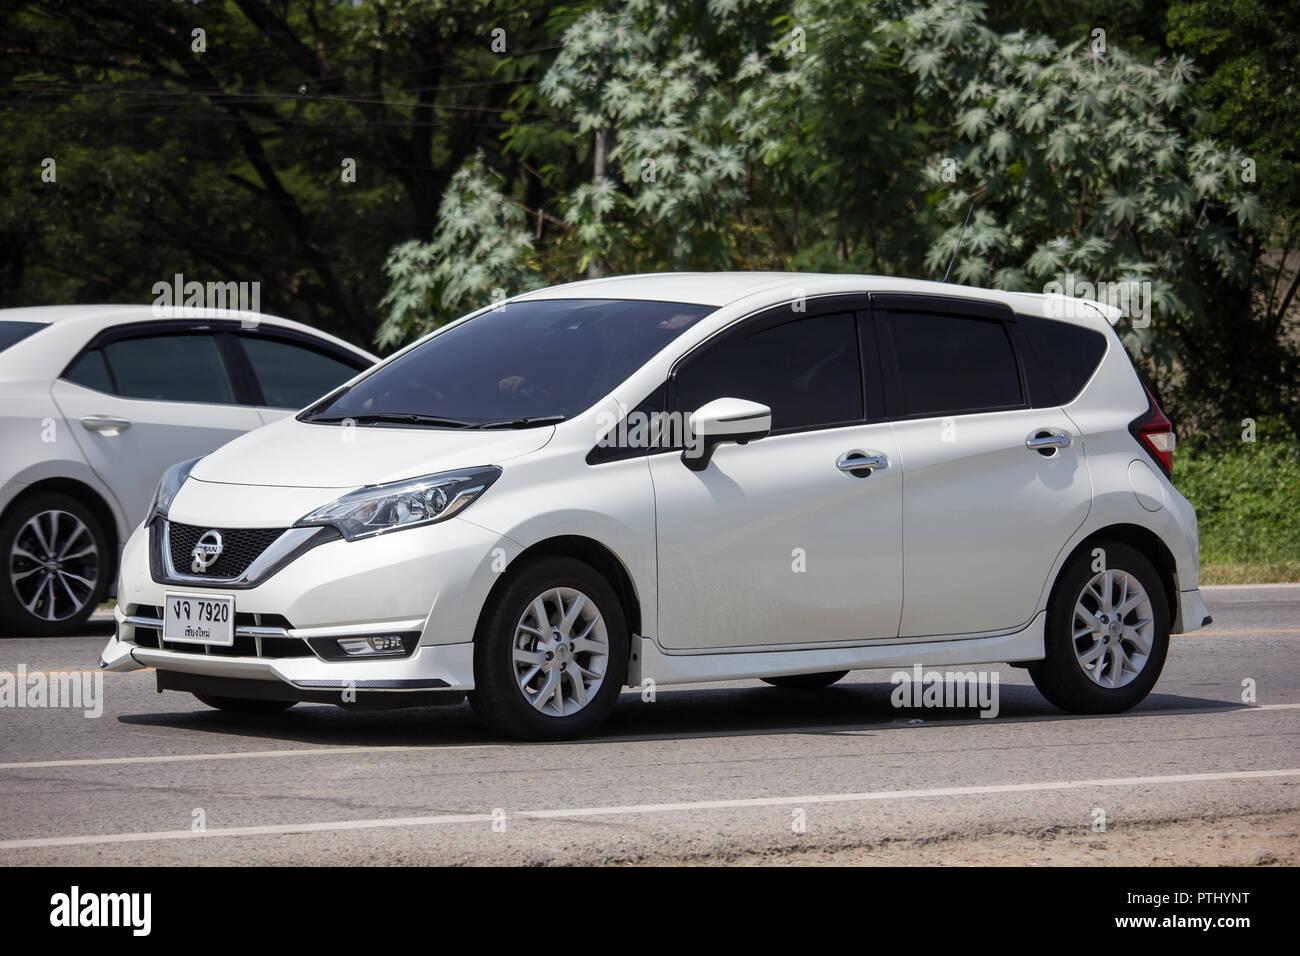 chiangmai, thailand - september 17 2018: private new eco car nissan